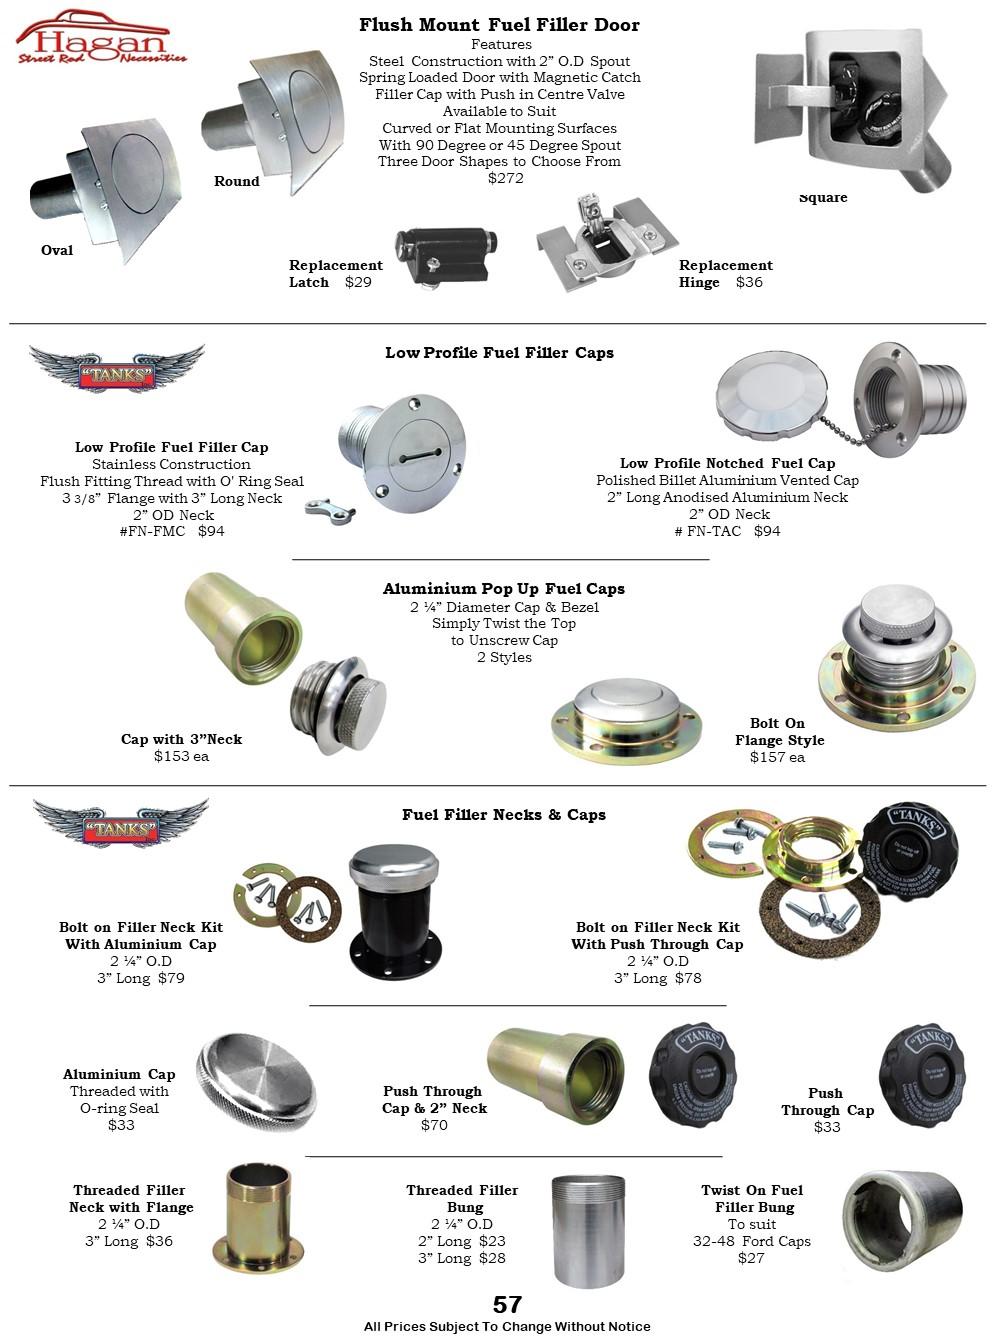 Car Fuel Tanks, Steel Tanks, Senders, Fuel Pumps, Filler